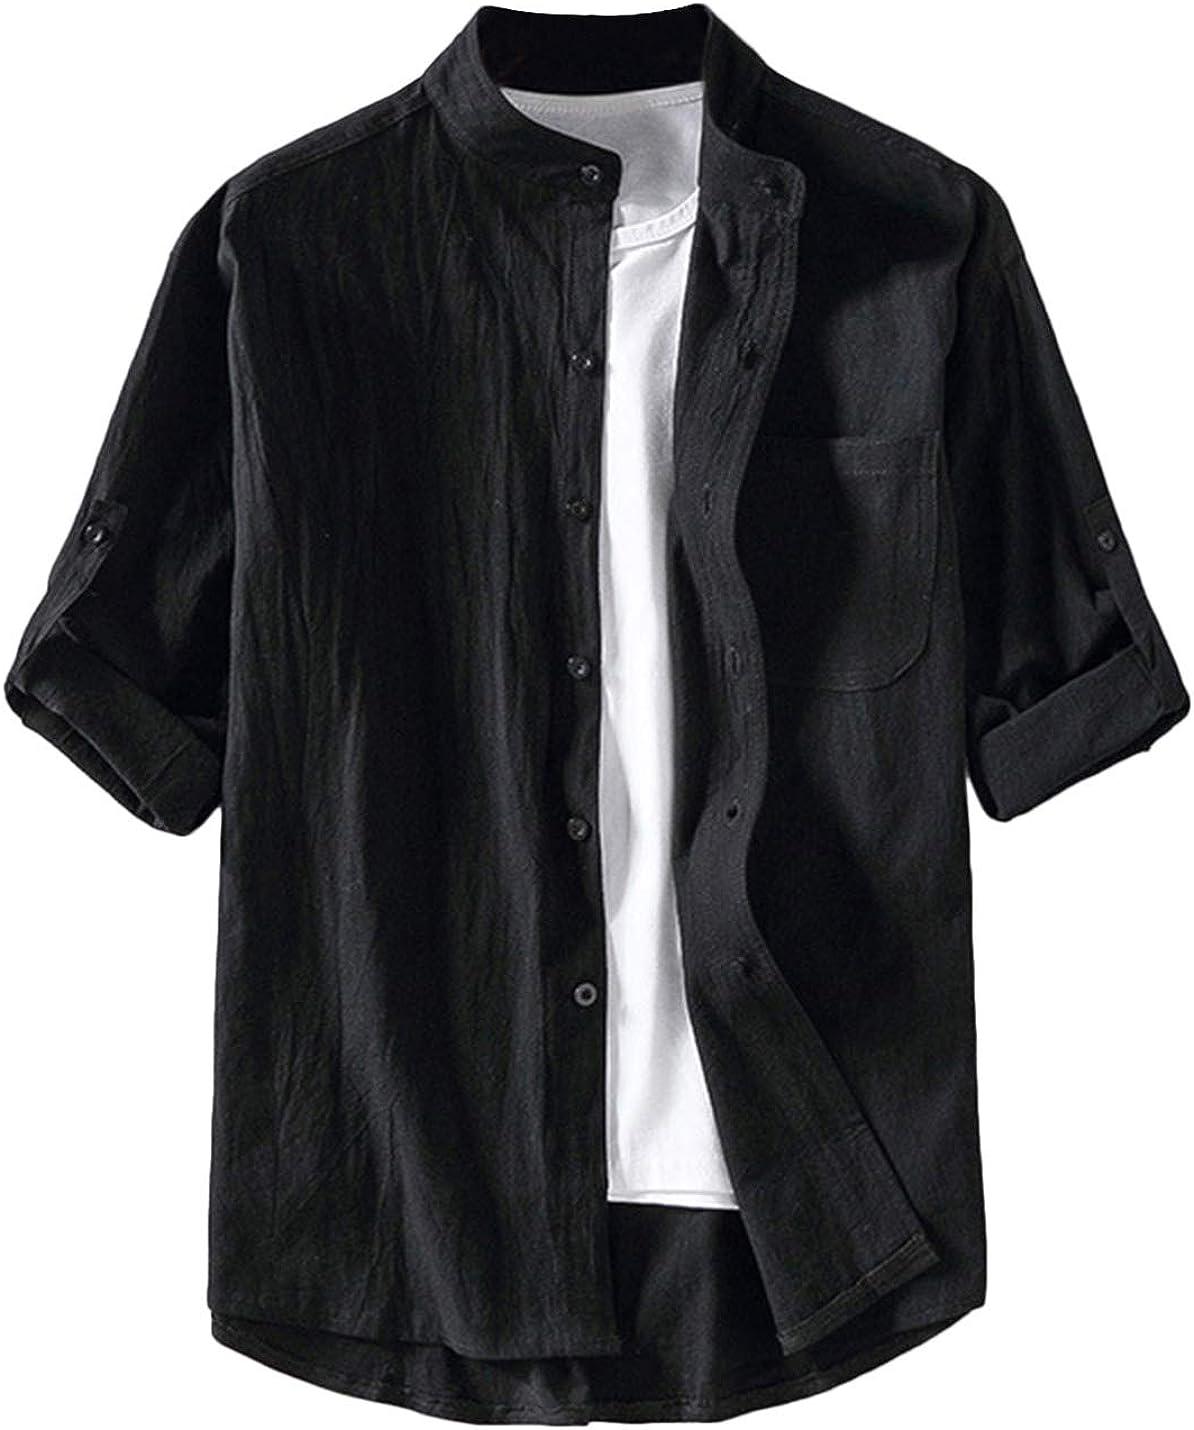 Lentta Men's Loose Casual Button Down Mandarin Collar Short Sleeve Linen Shirts